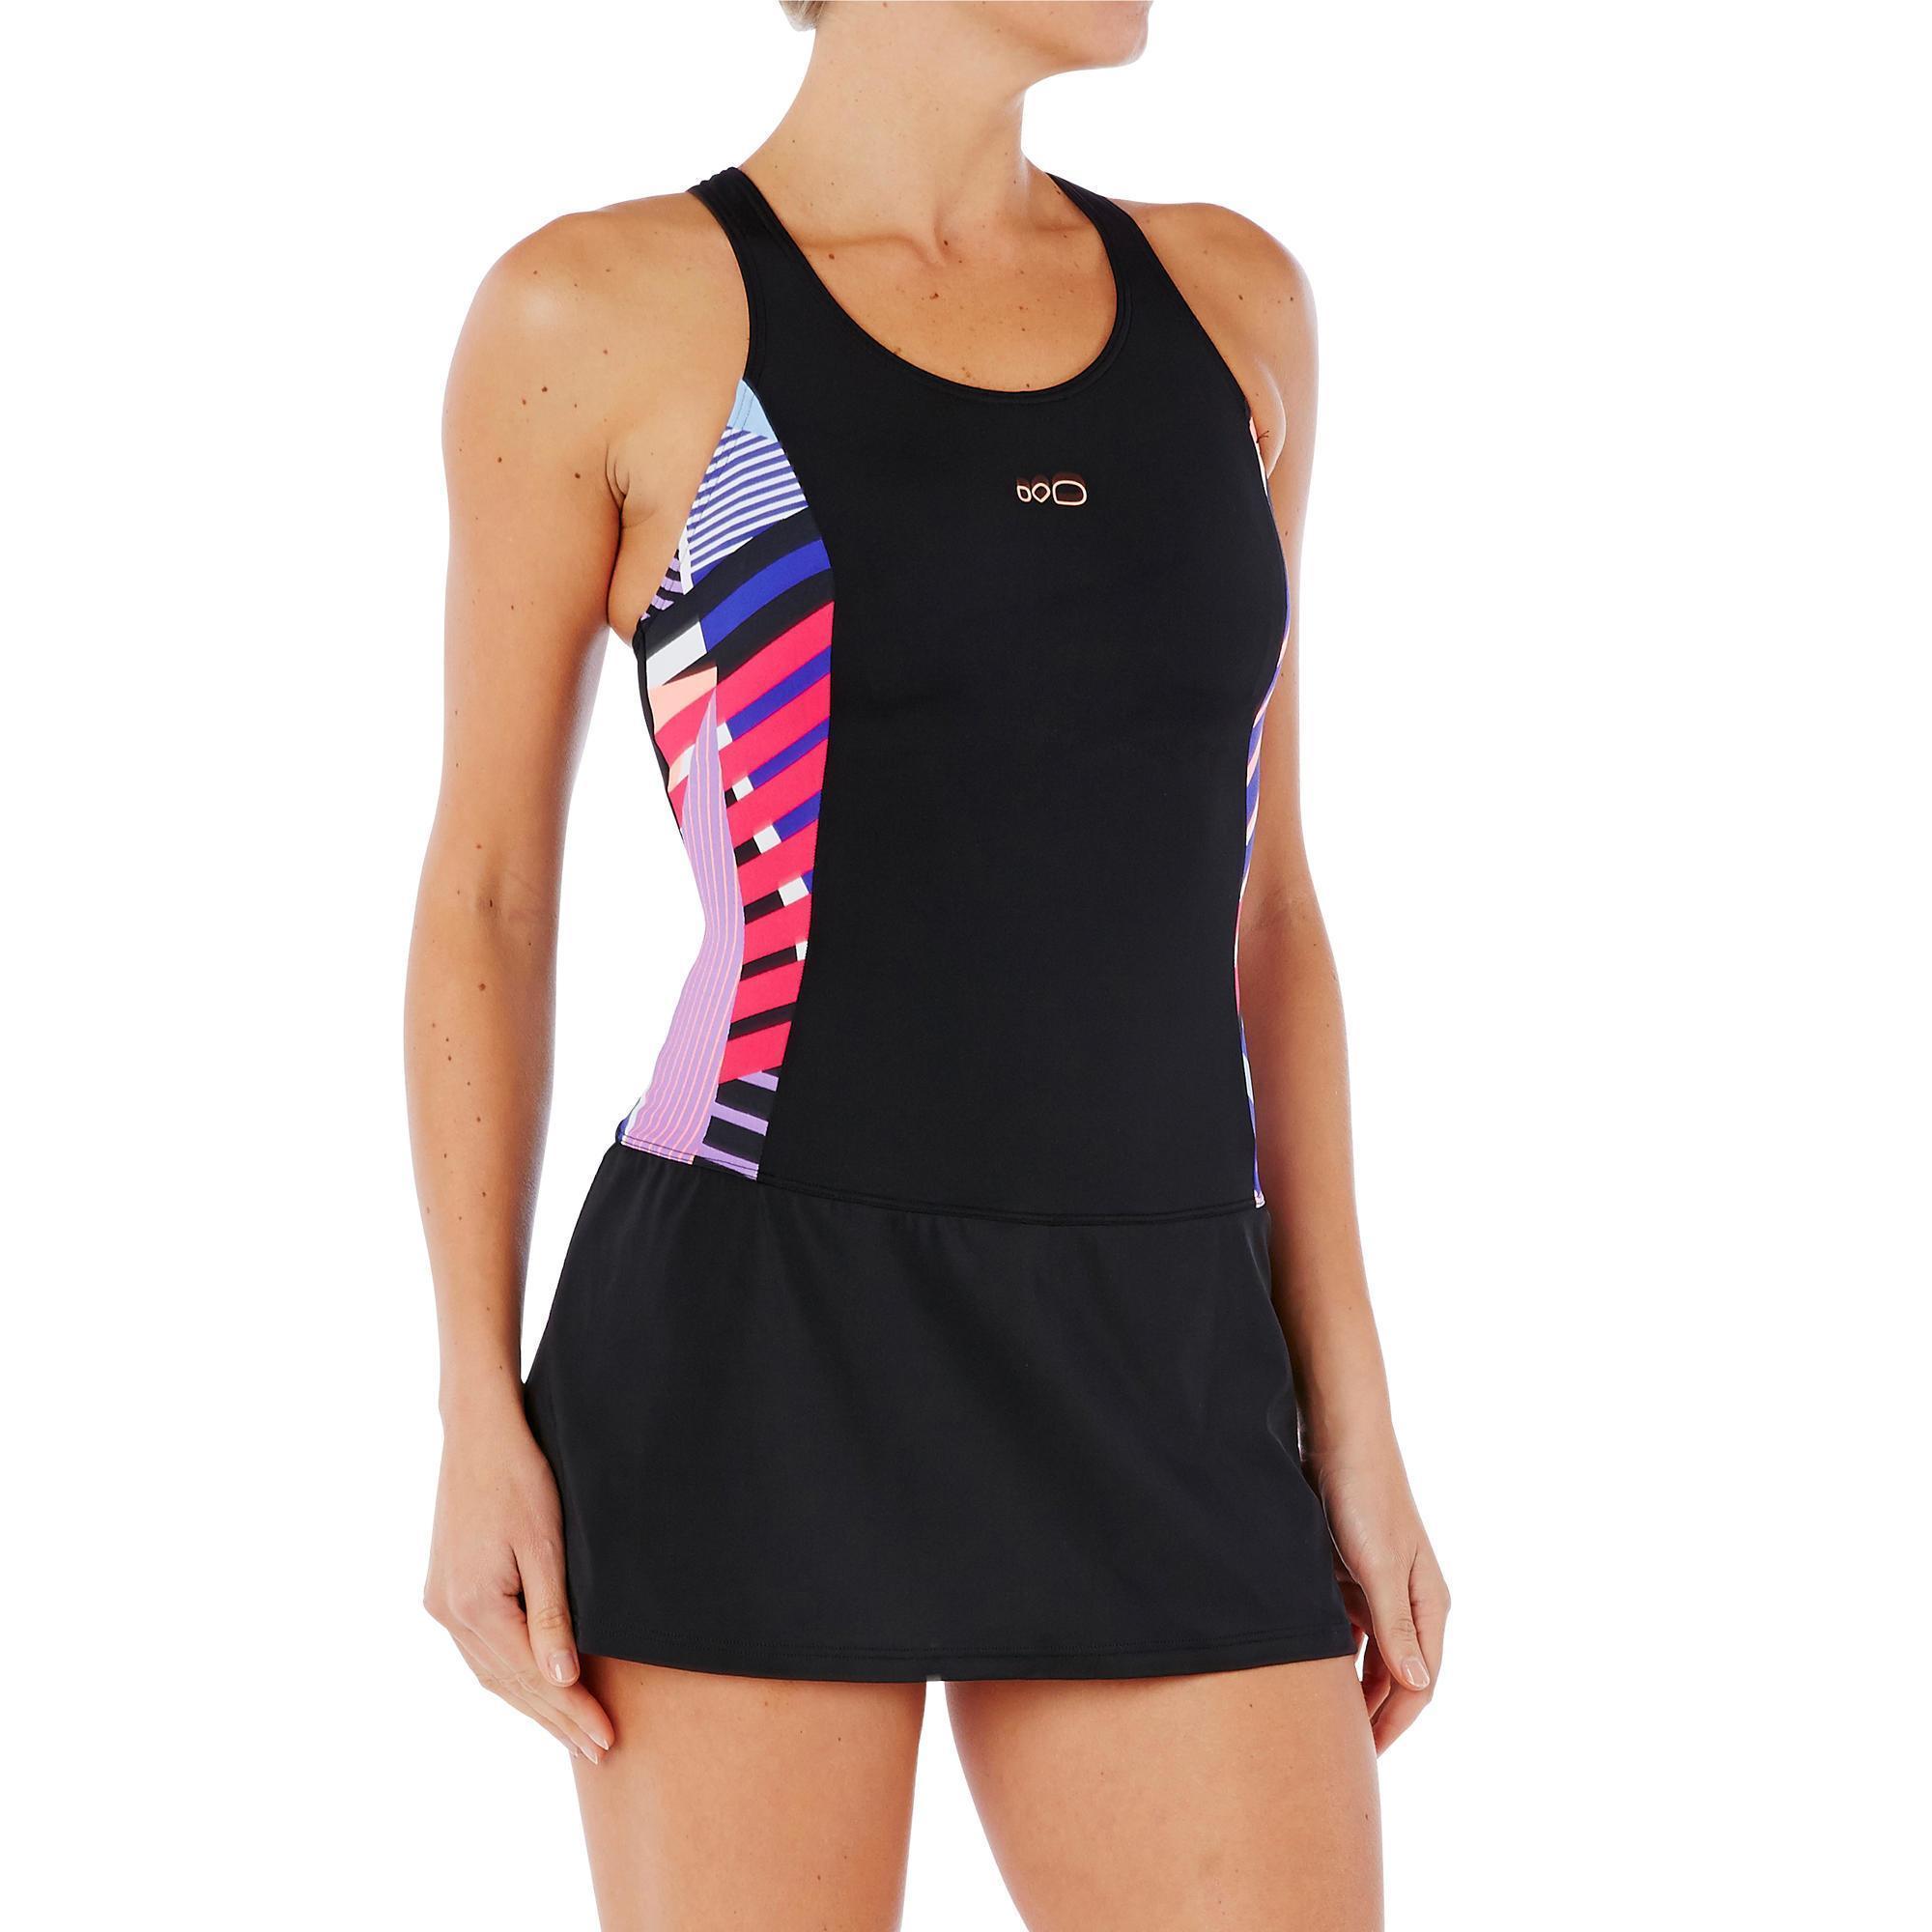 maillot de bain de natation femme une pi ce vega skirt. Black Bedroom Furniture Sets. Home Design Ideas